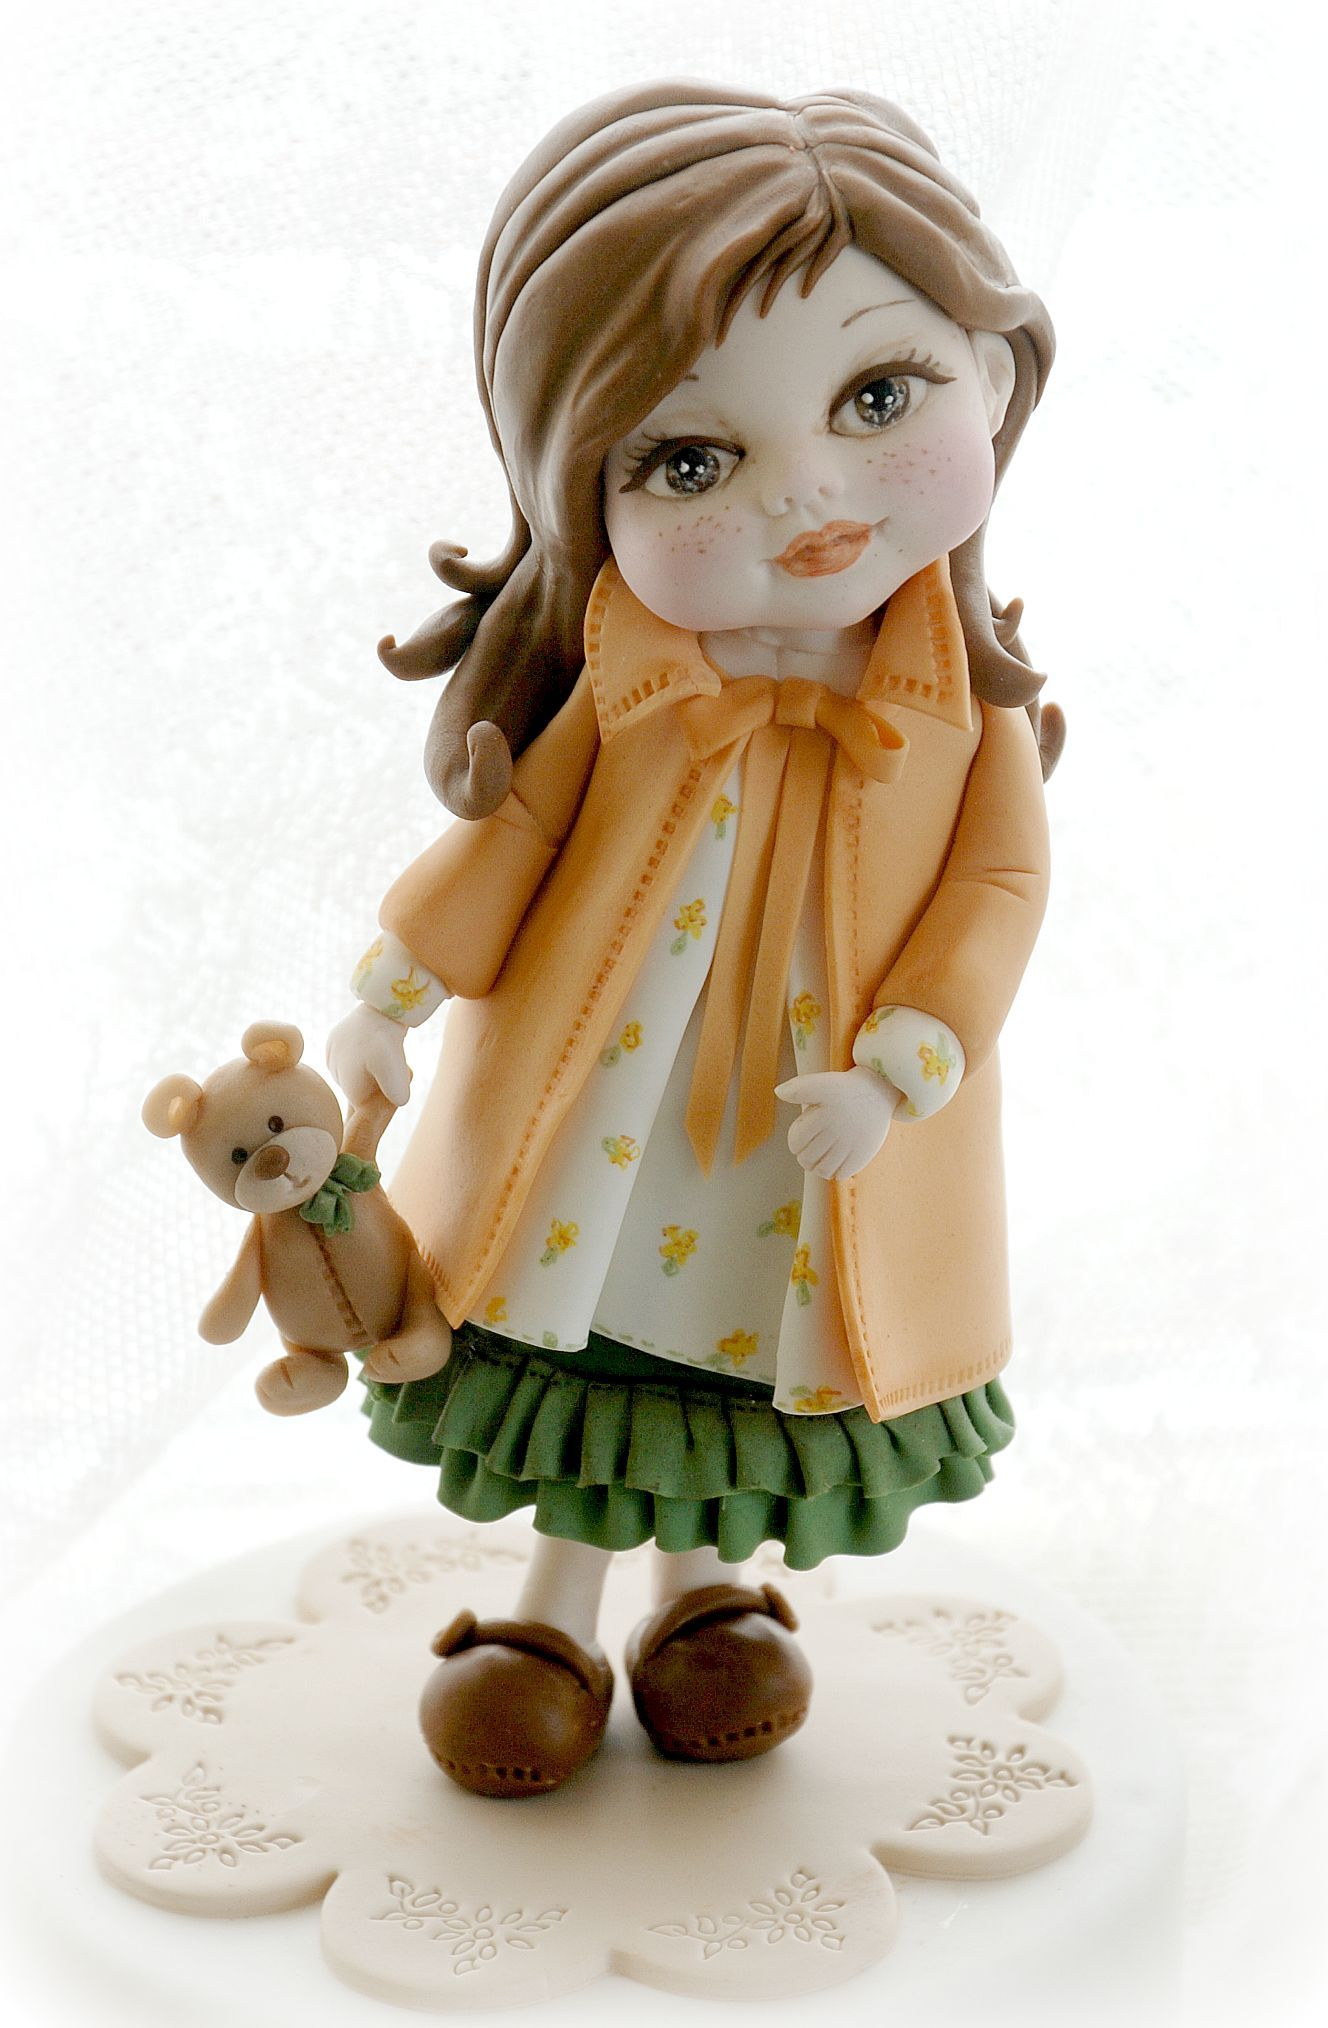 Little girl with teddy bear fondant figurine